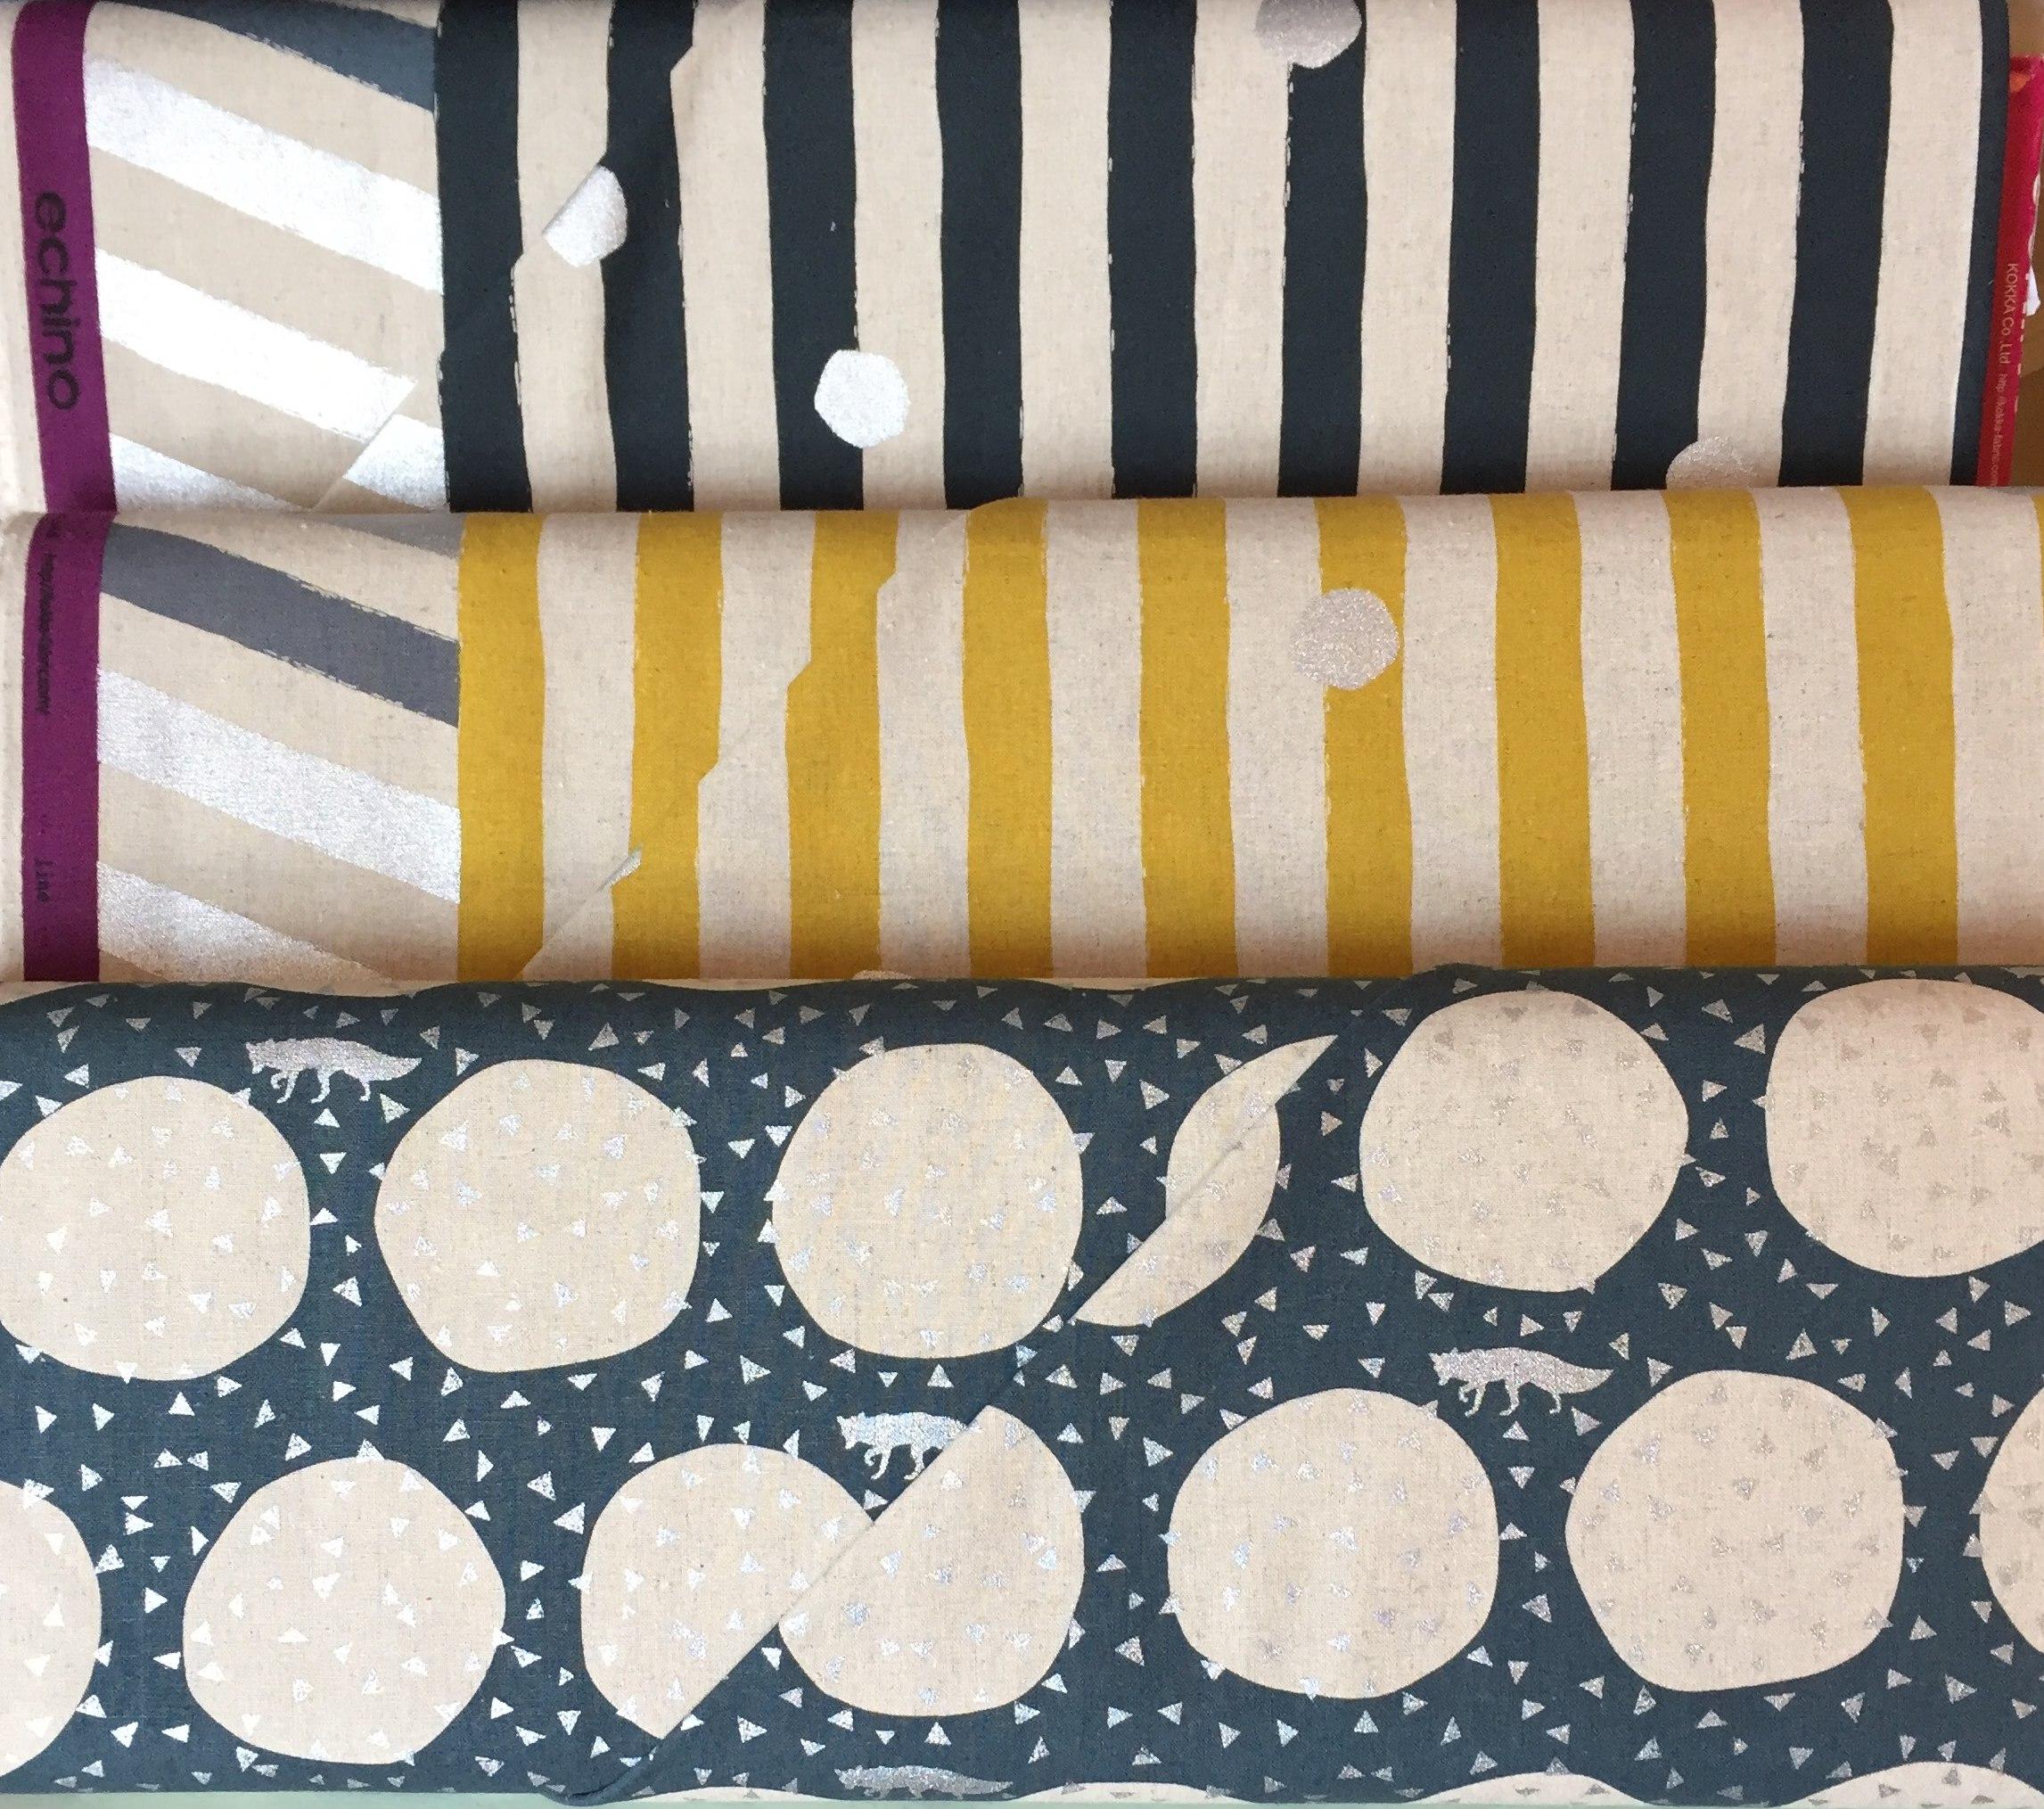 Cotton linen blend from Echino